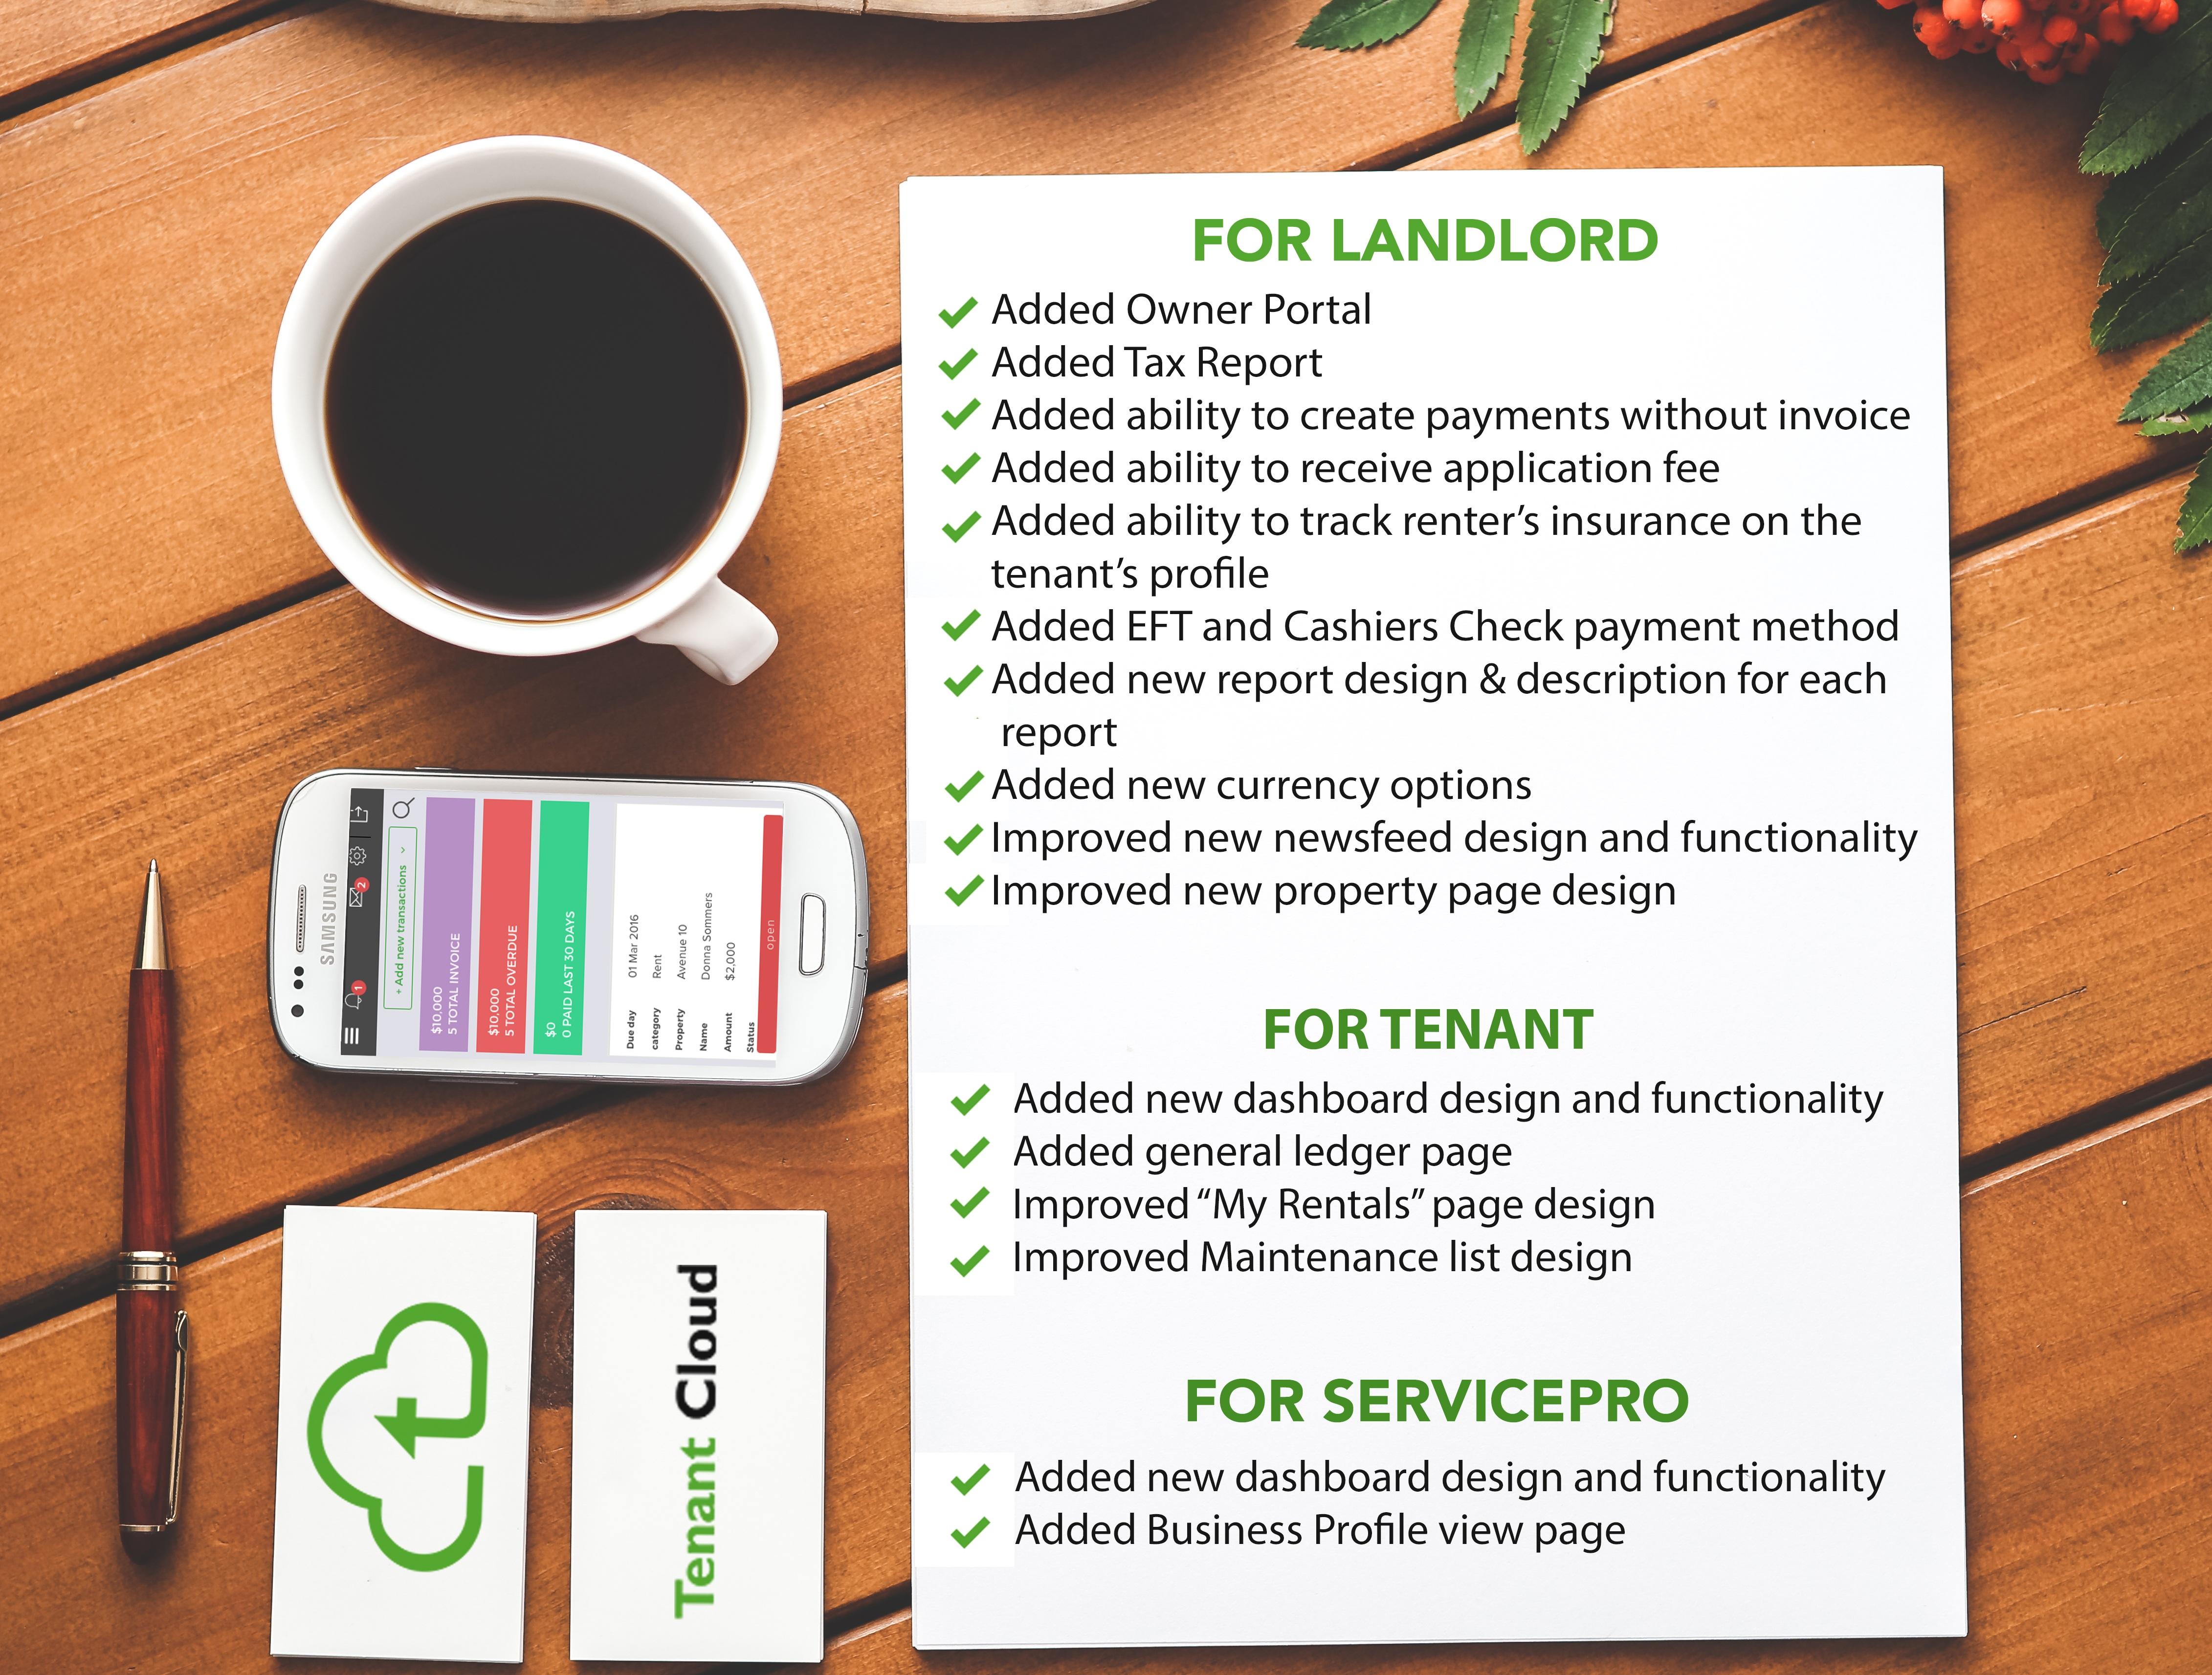 TenantCloud system updates